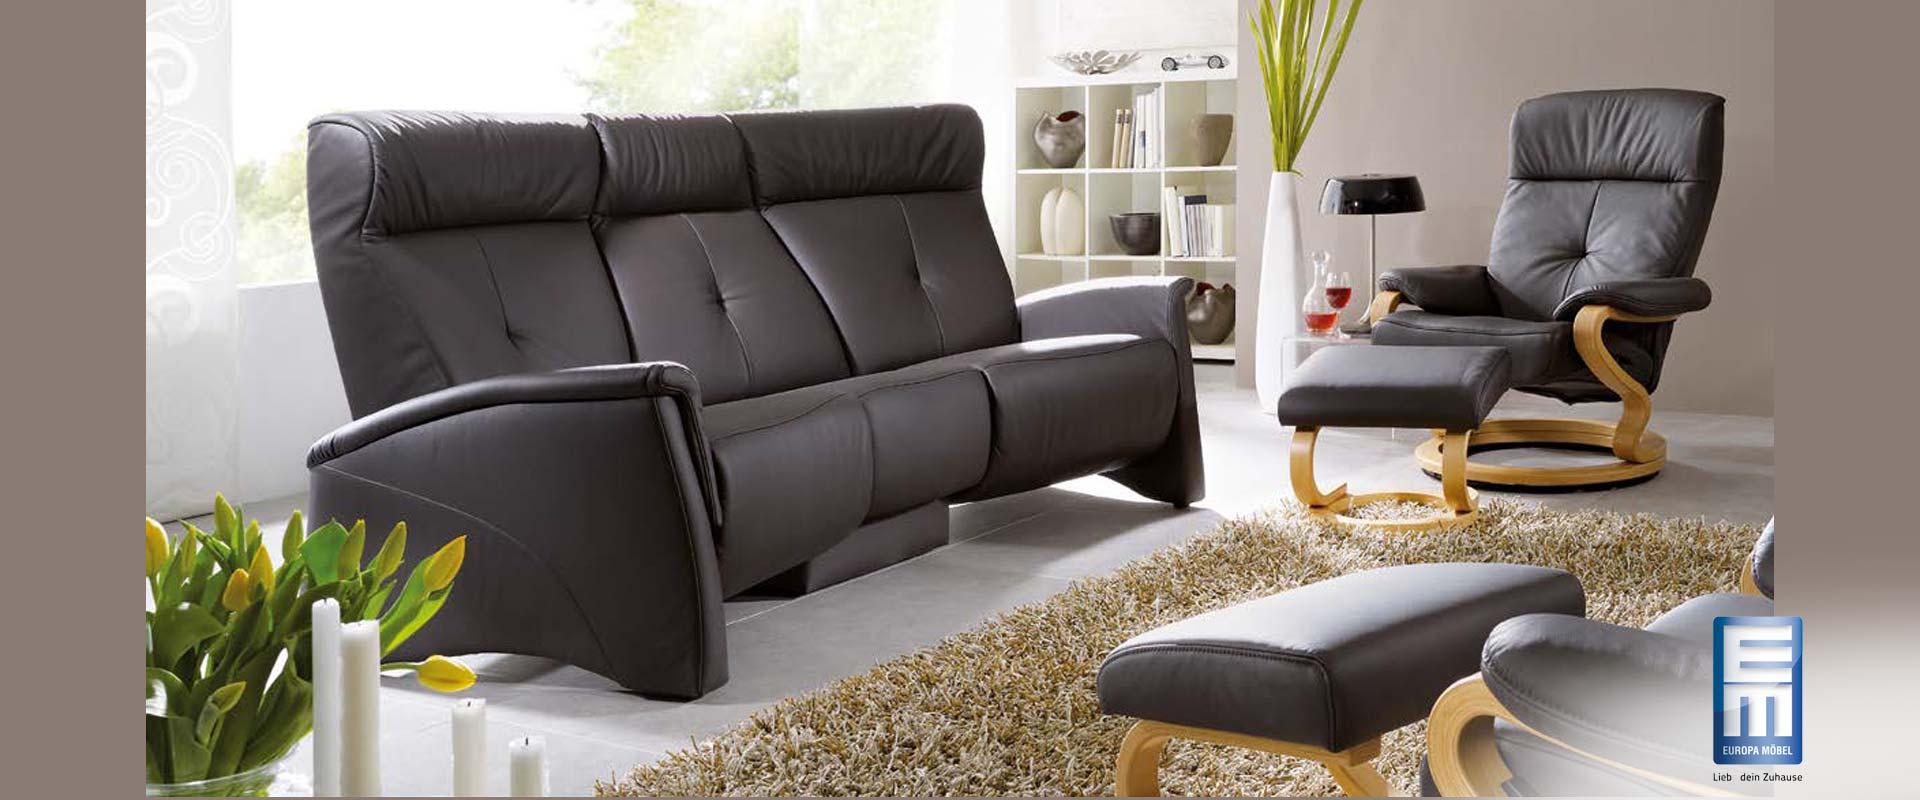 polsterm bel europa m bel in berlin domeyer m bel und k chen. Black Bedroom Furniture Sets. Home Design Ideas